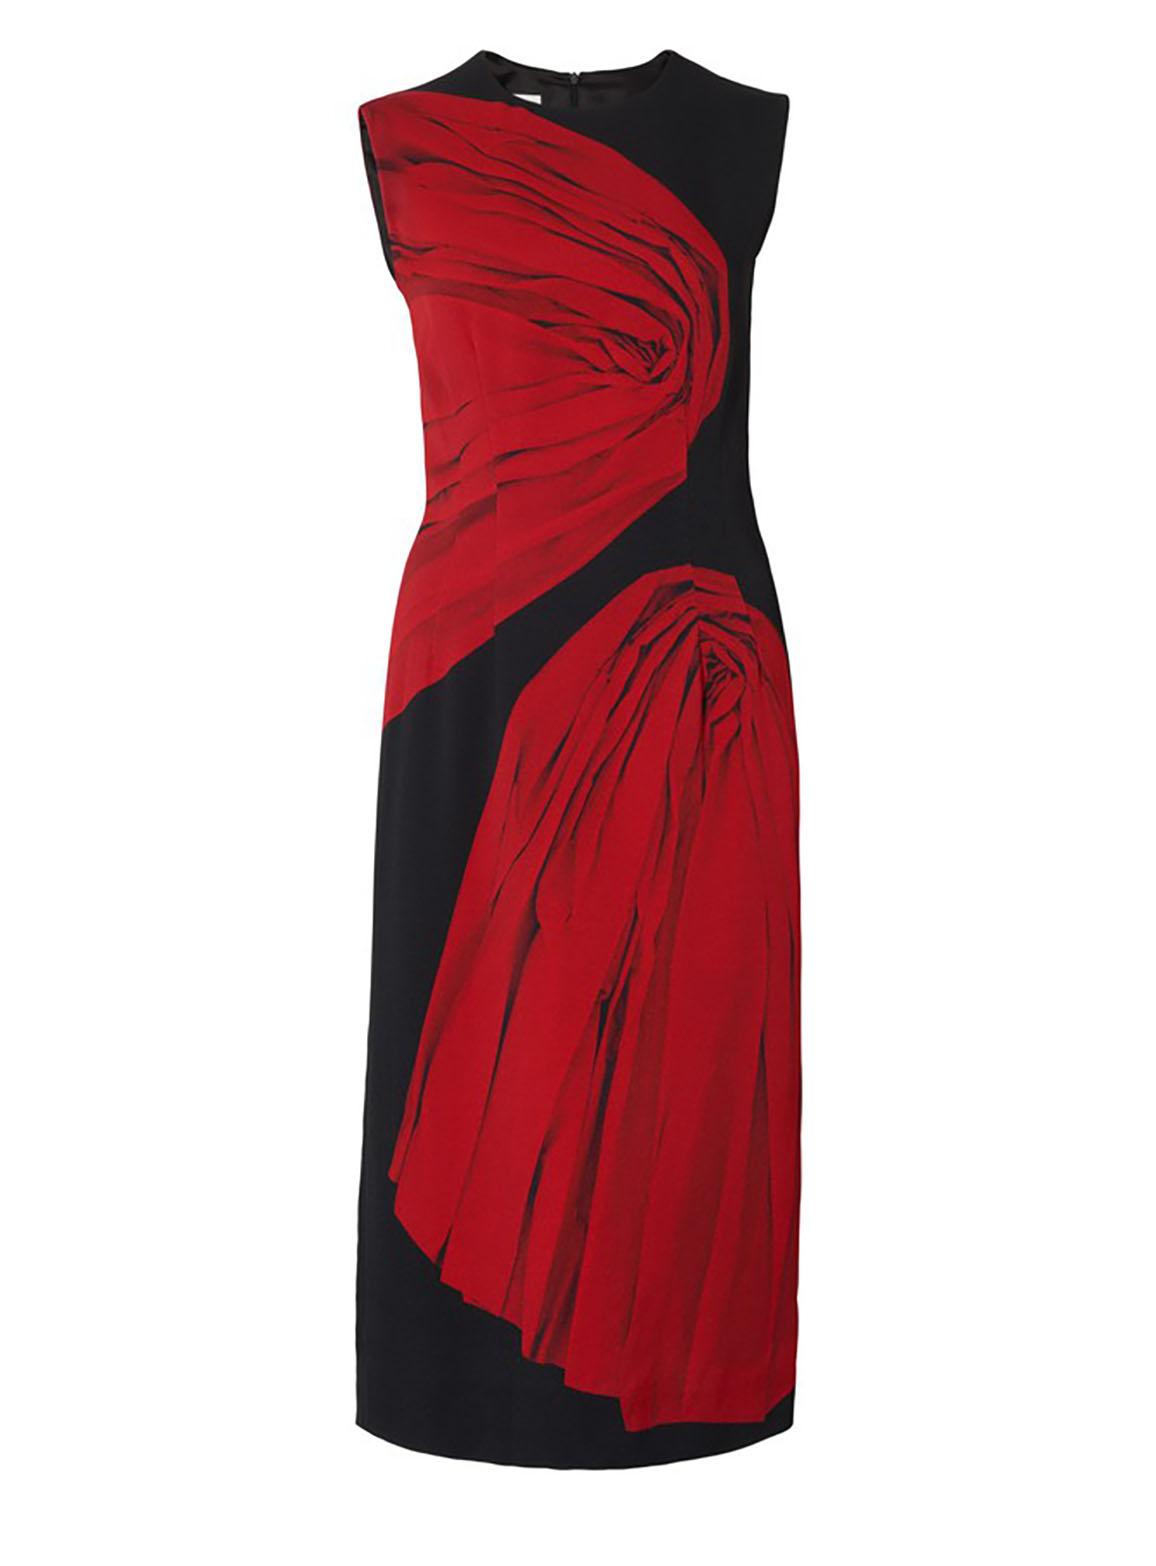 Delavina dress